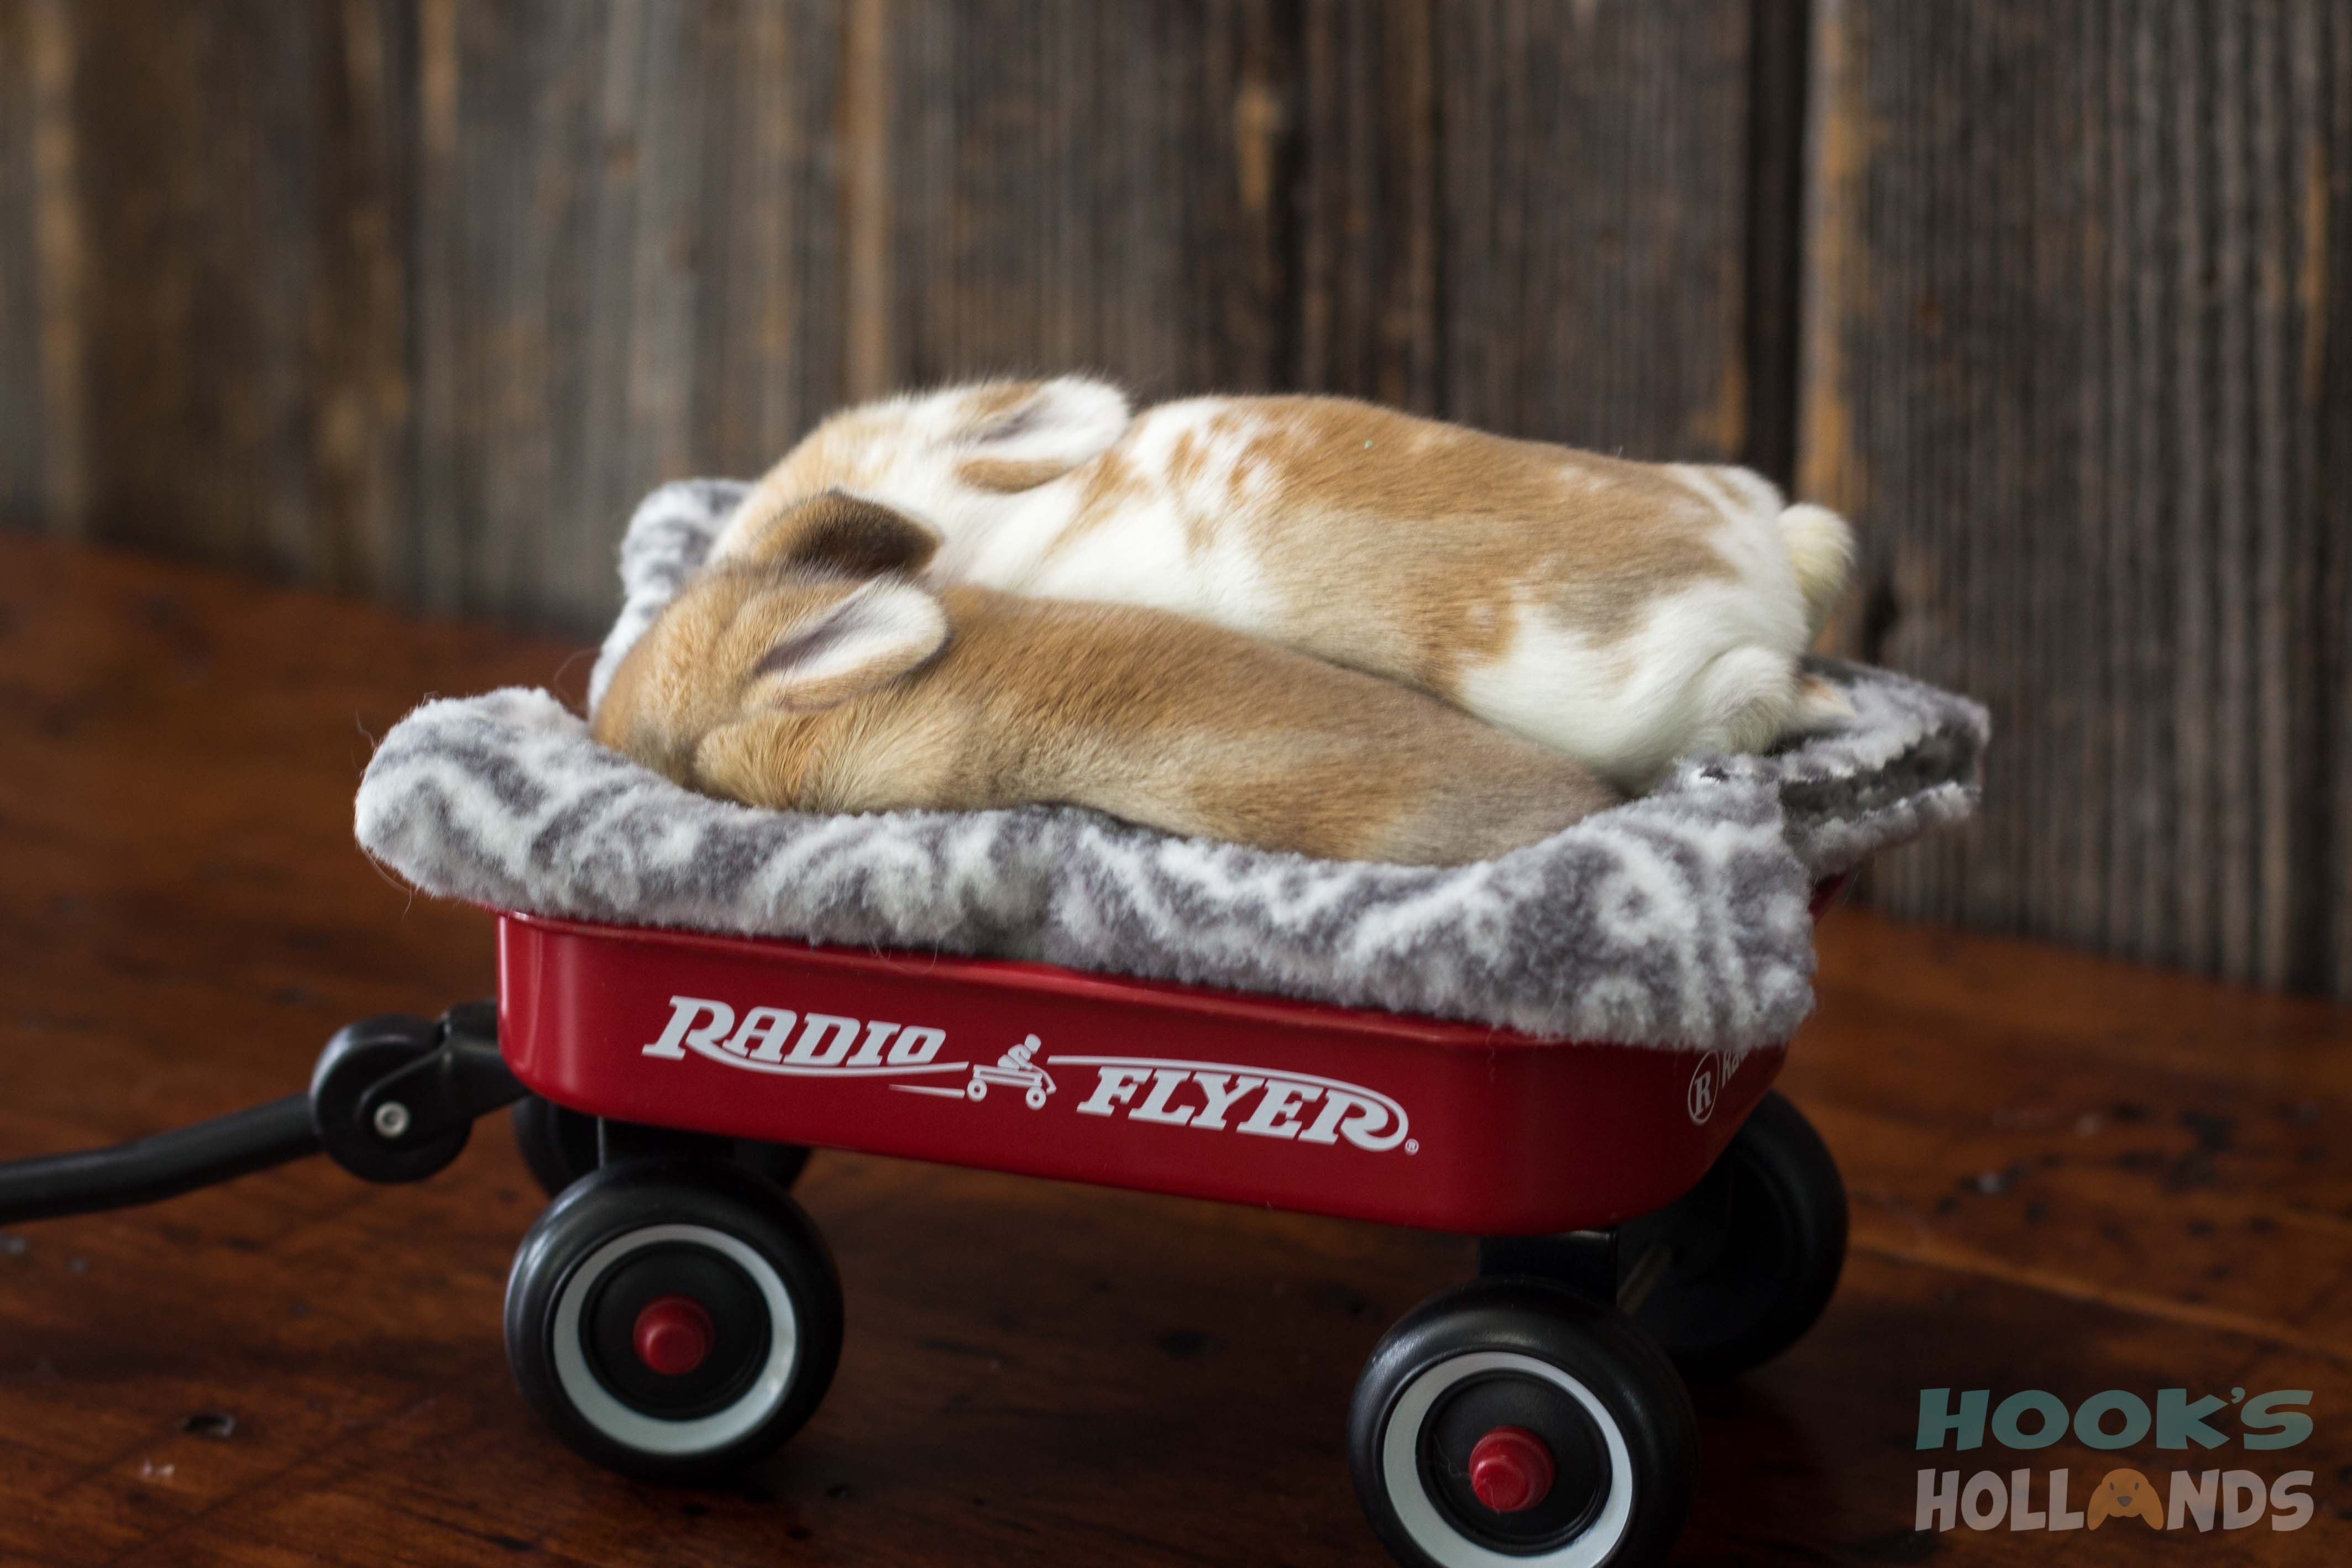 Orange baby Holland lop bunnies sleeping in a Radio Flyer